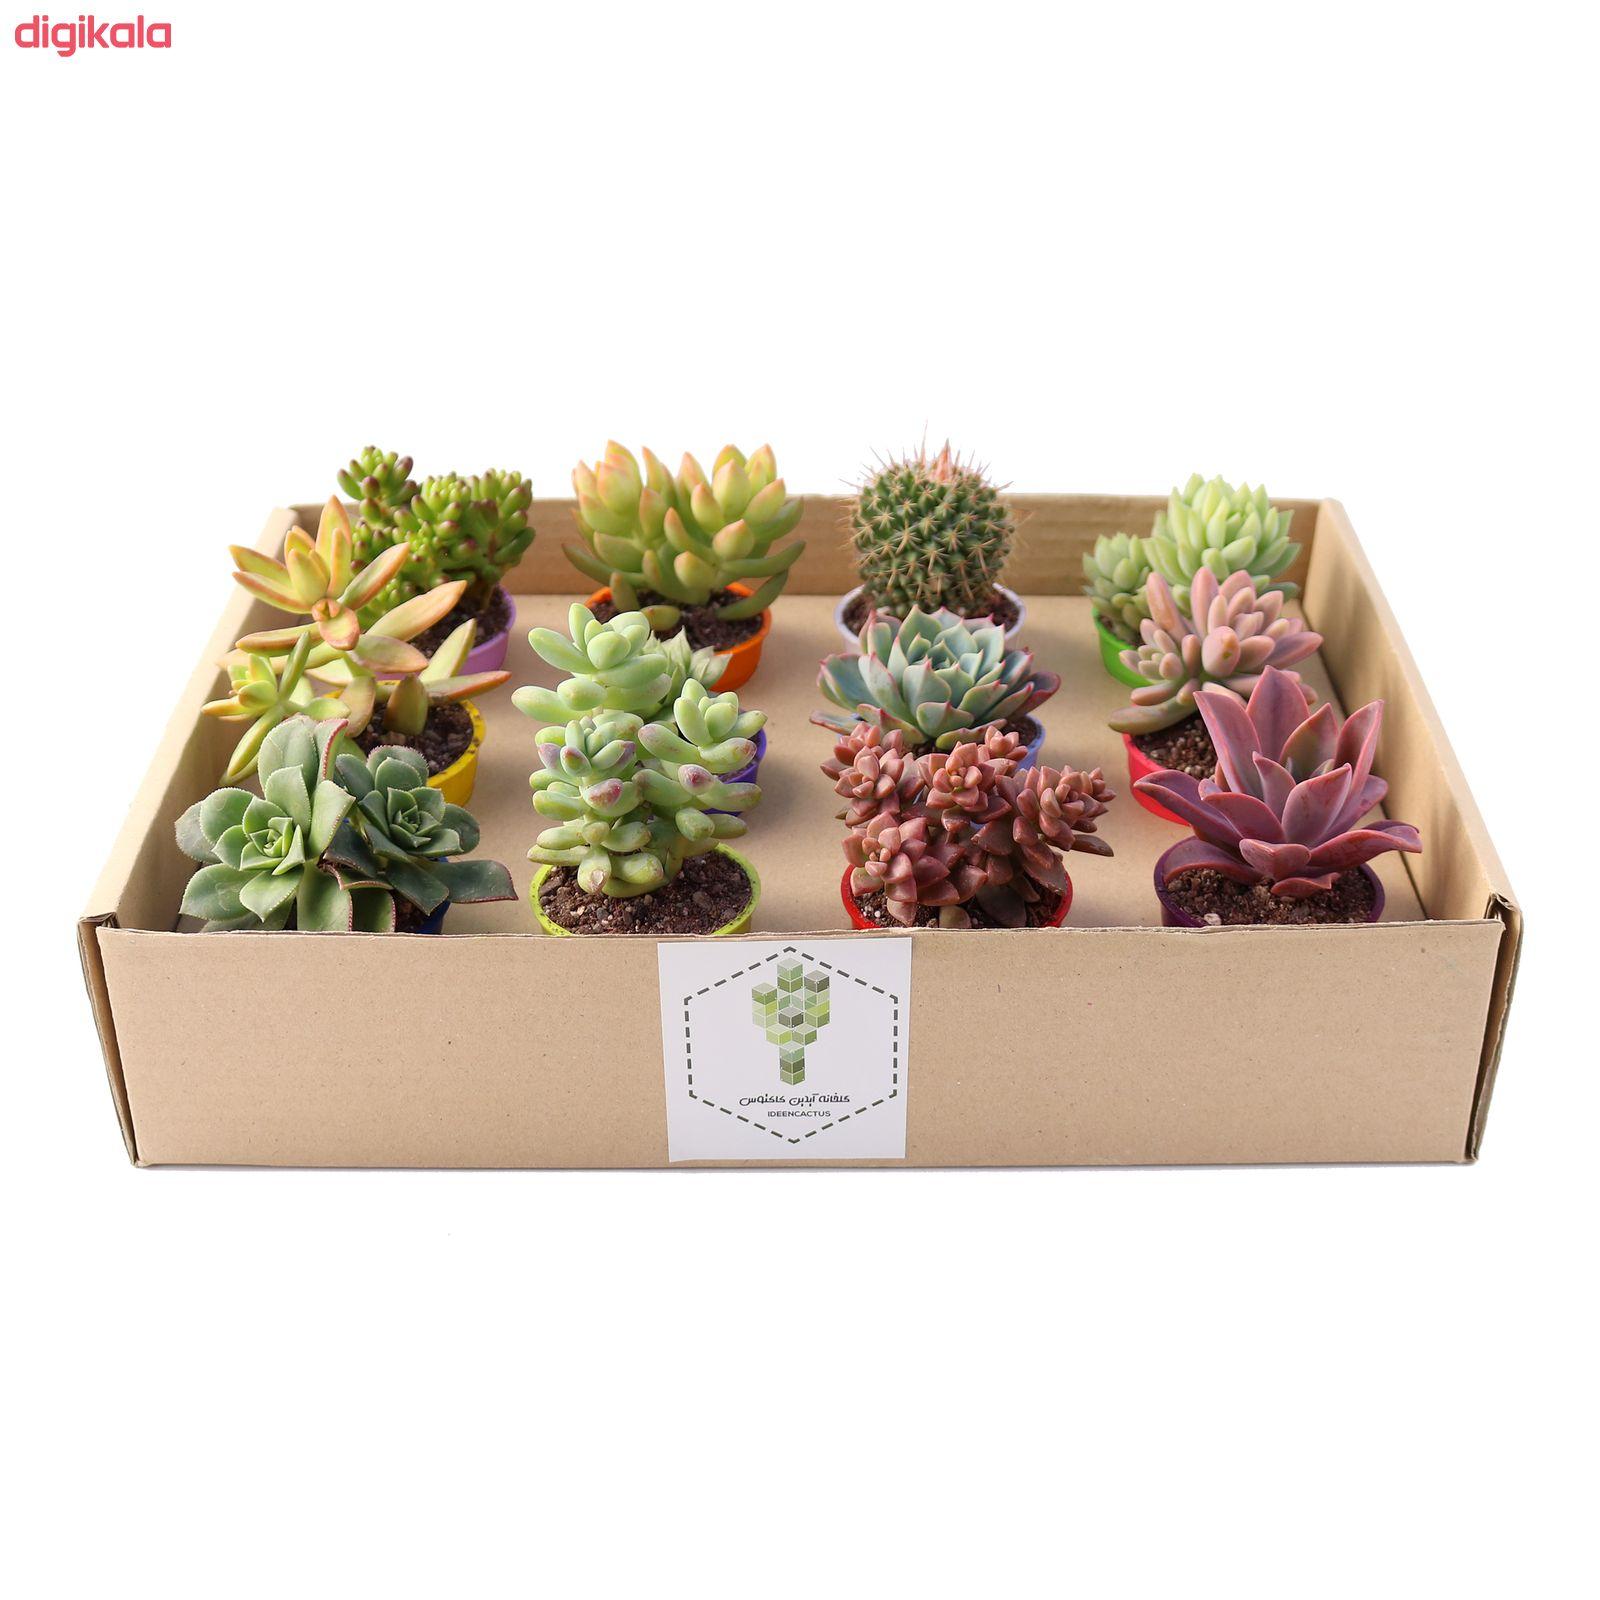 گیاه طبیعی کاکتوس و ساکولنت آیدین کاکتوس کد CB-009 بسته 12 عددی main 1 5